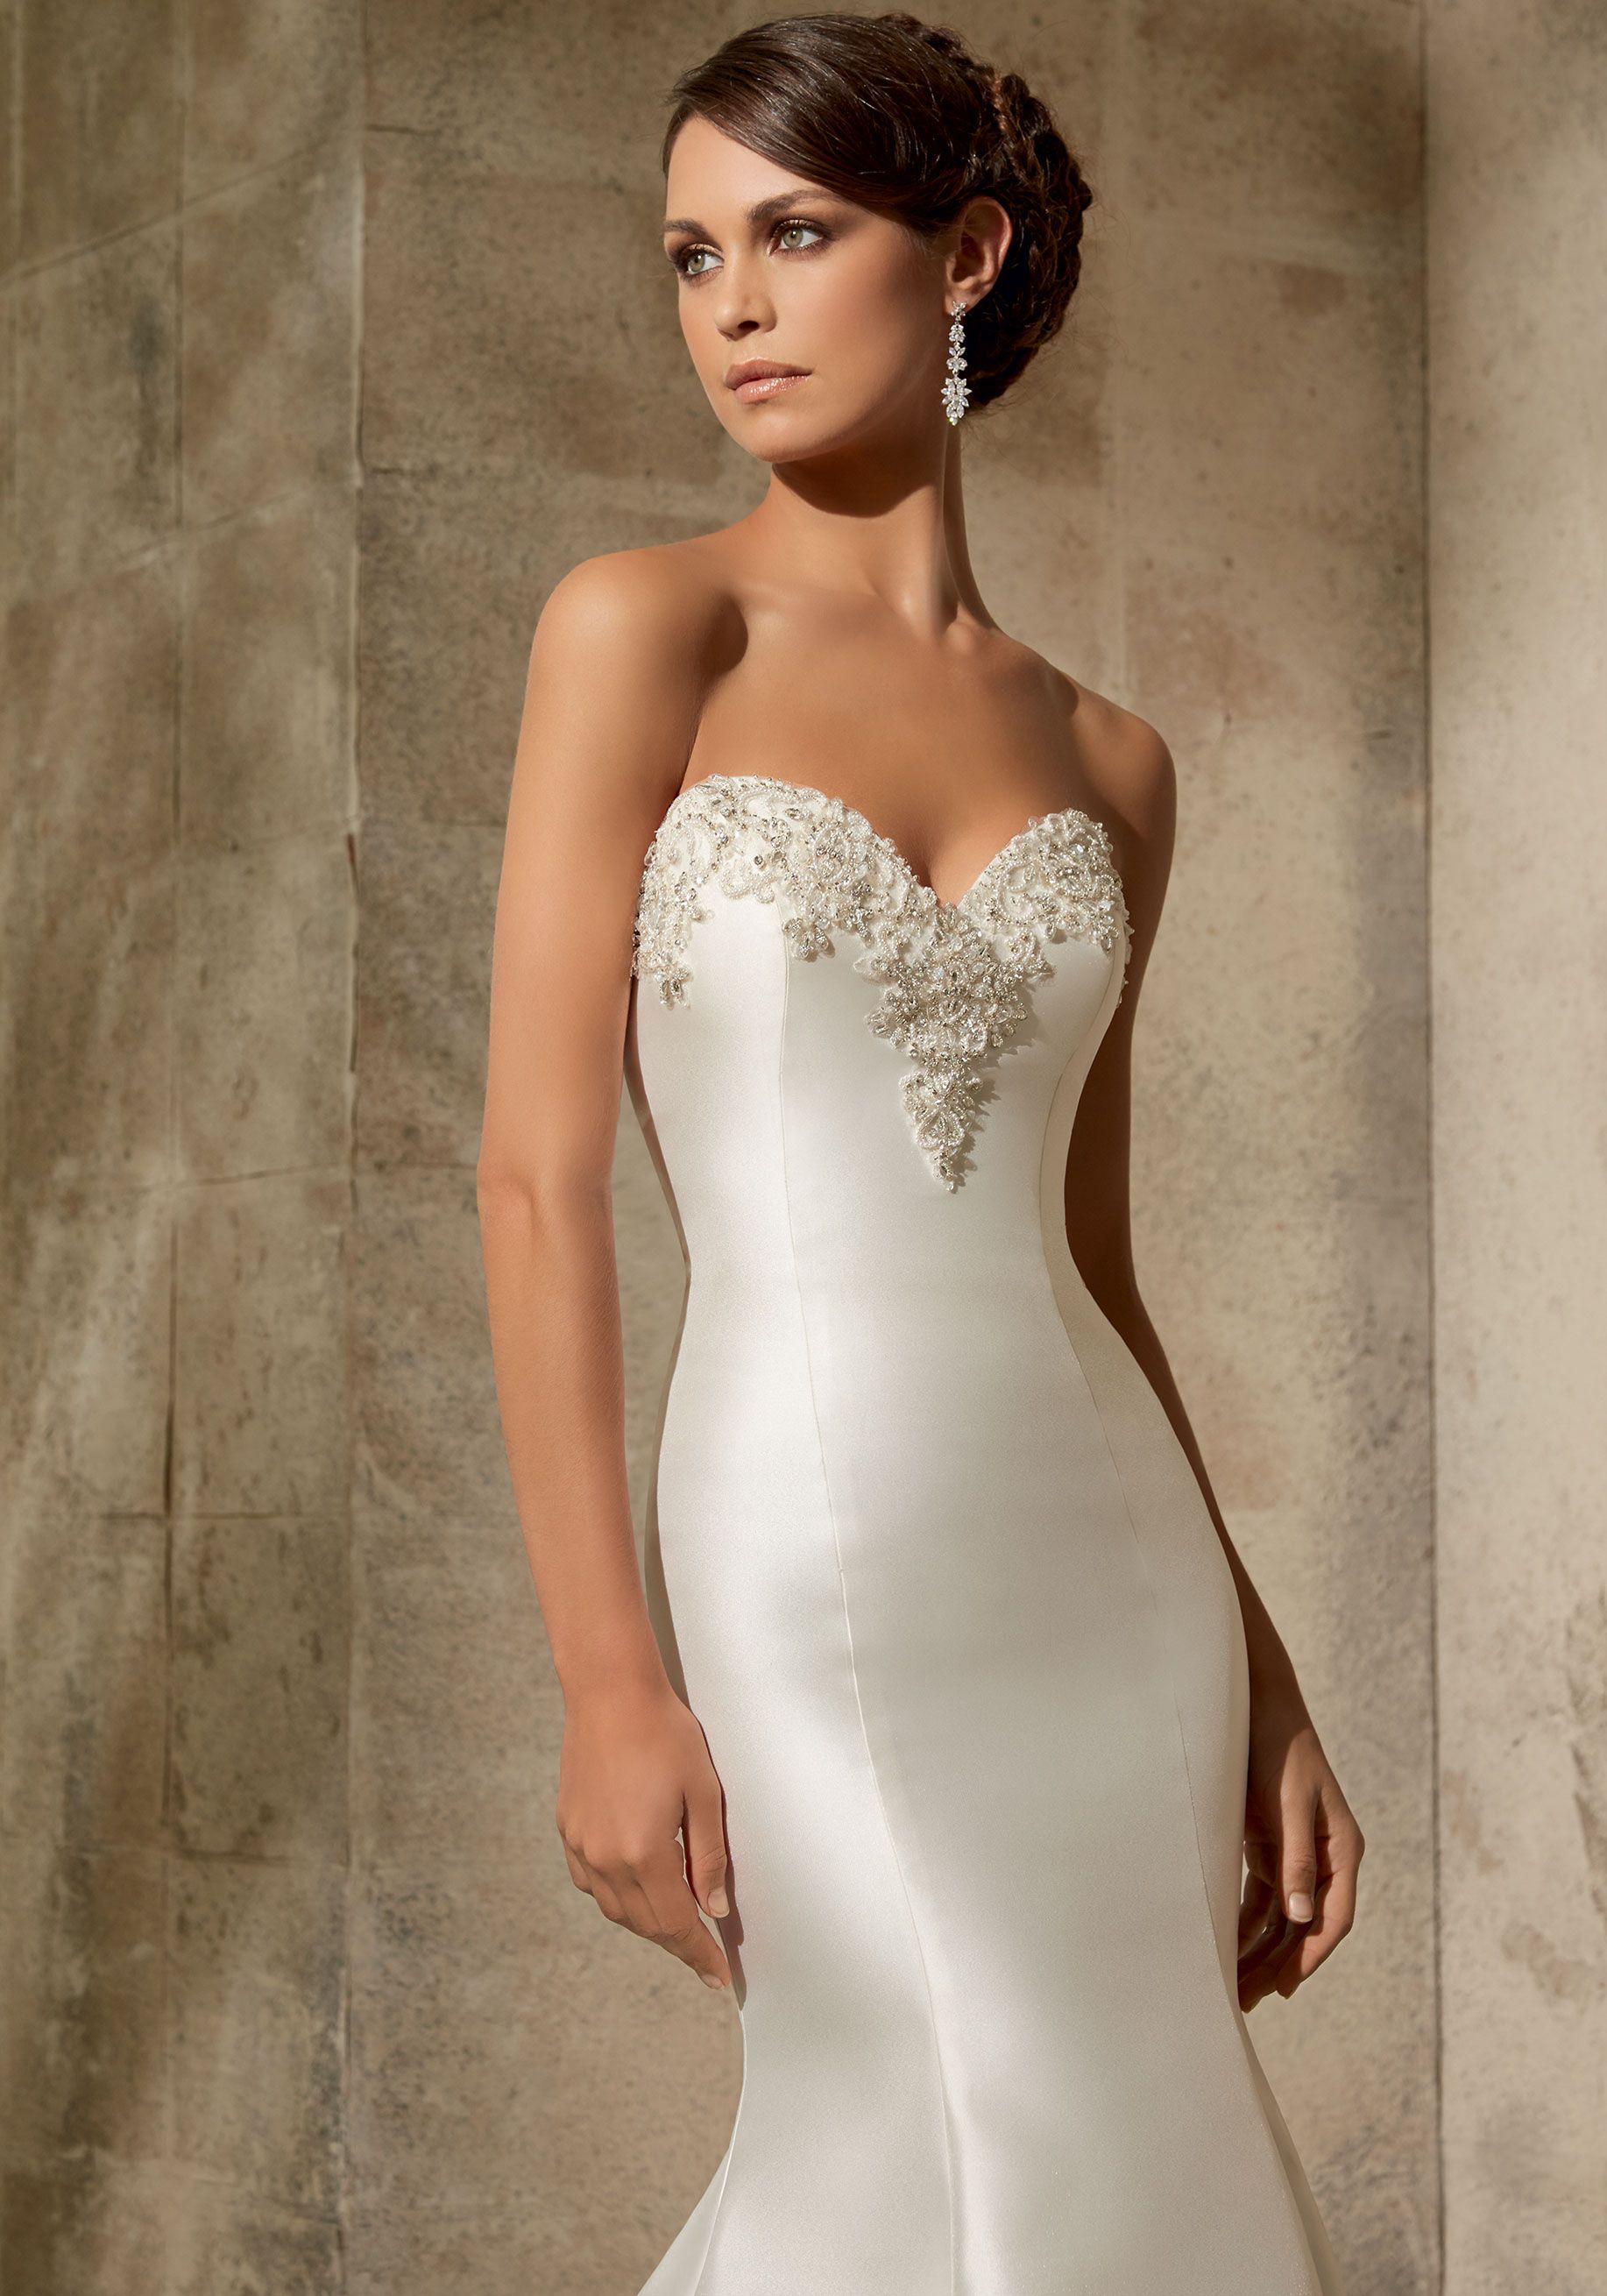 Sleek and modern, this Satin Bridal Dress features a deep sweetheart ...